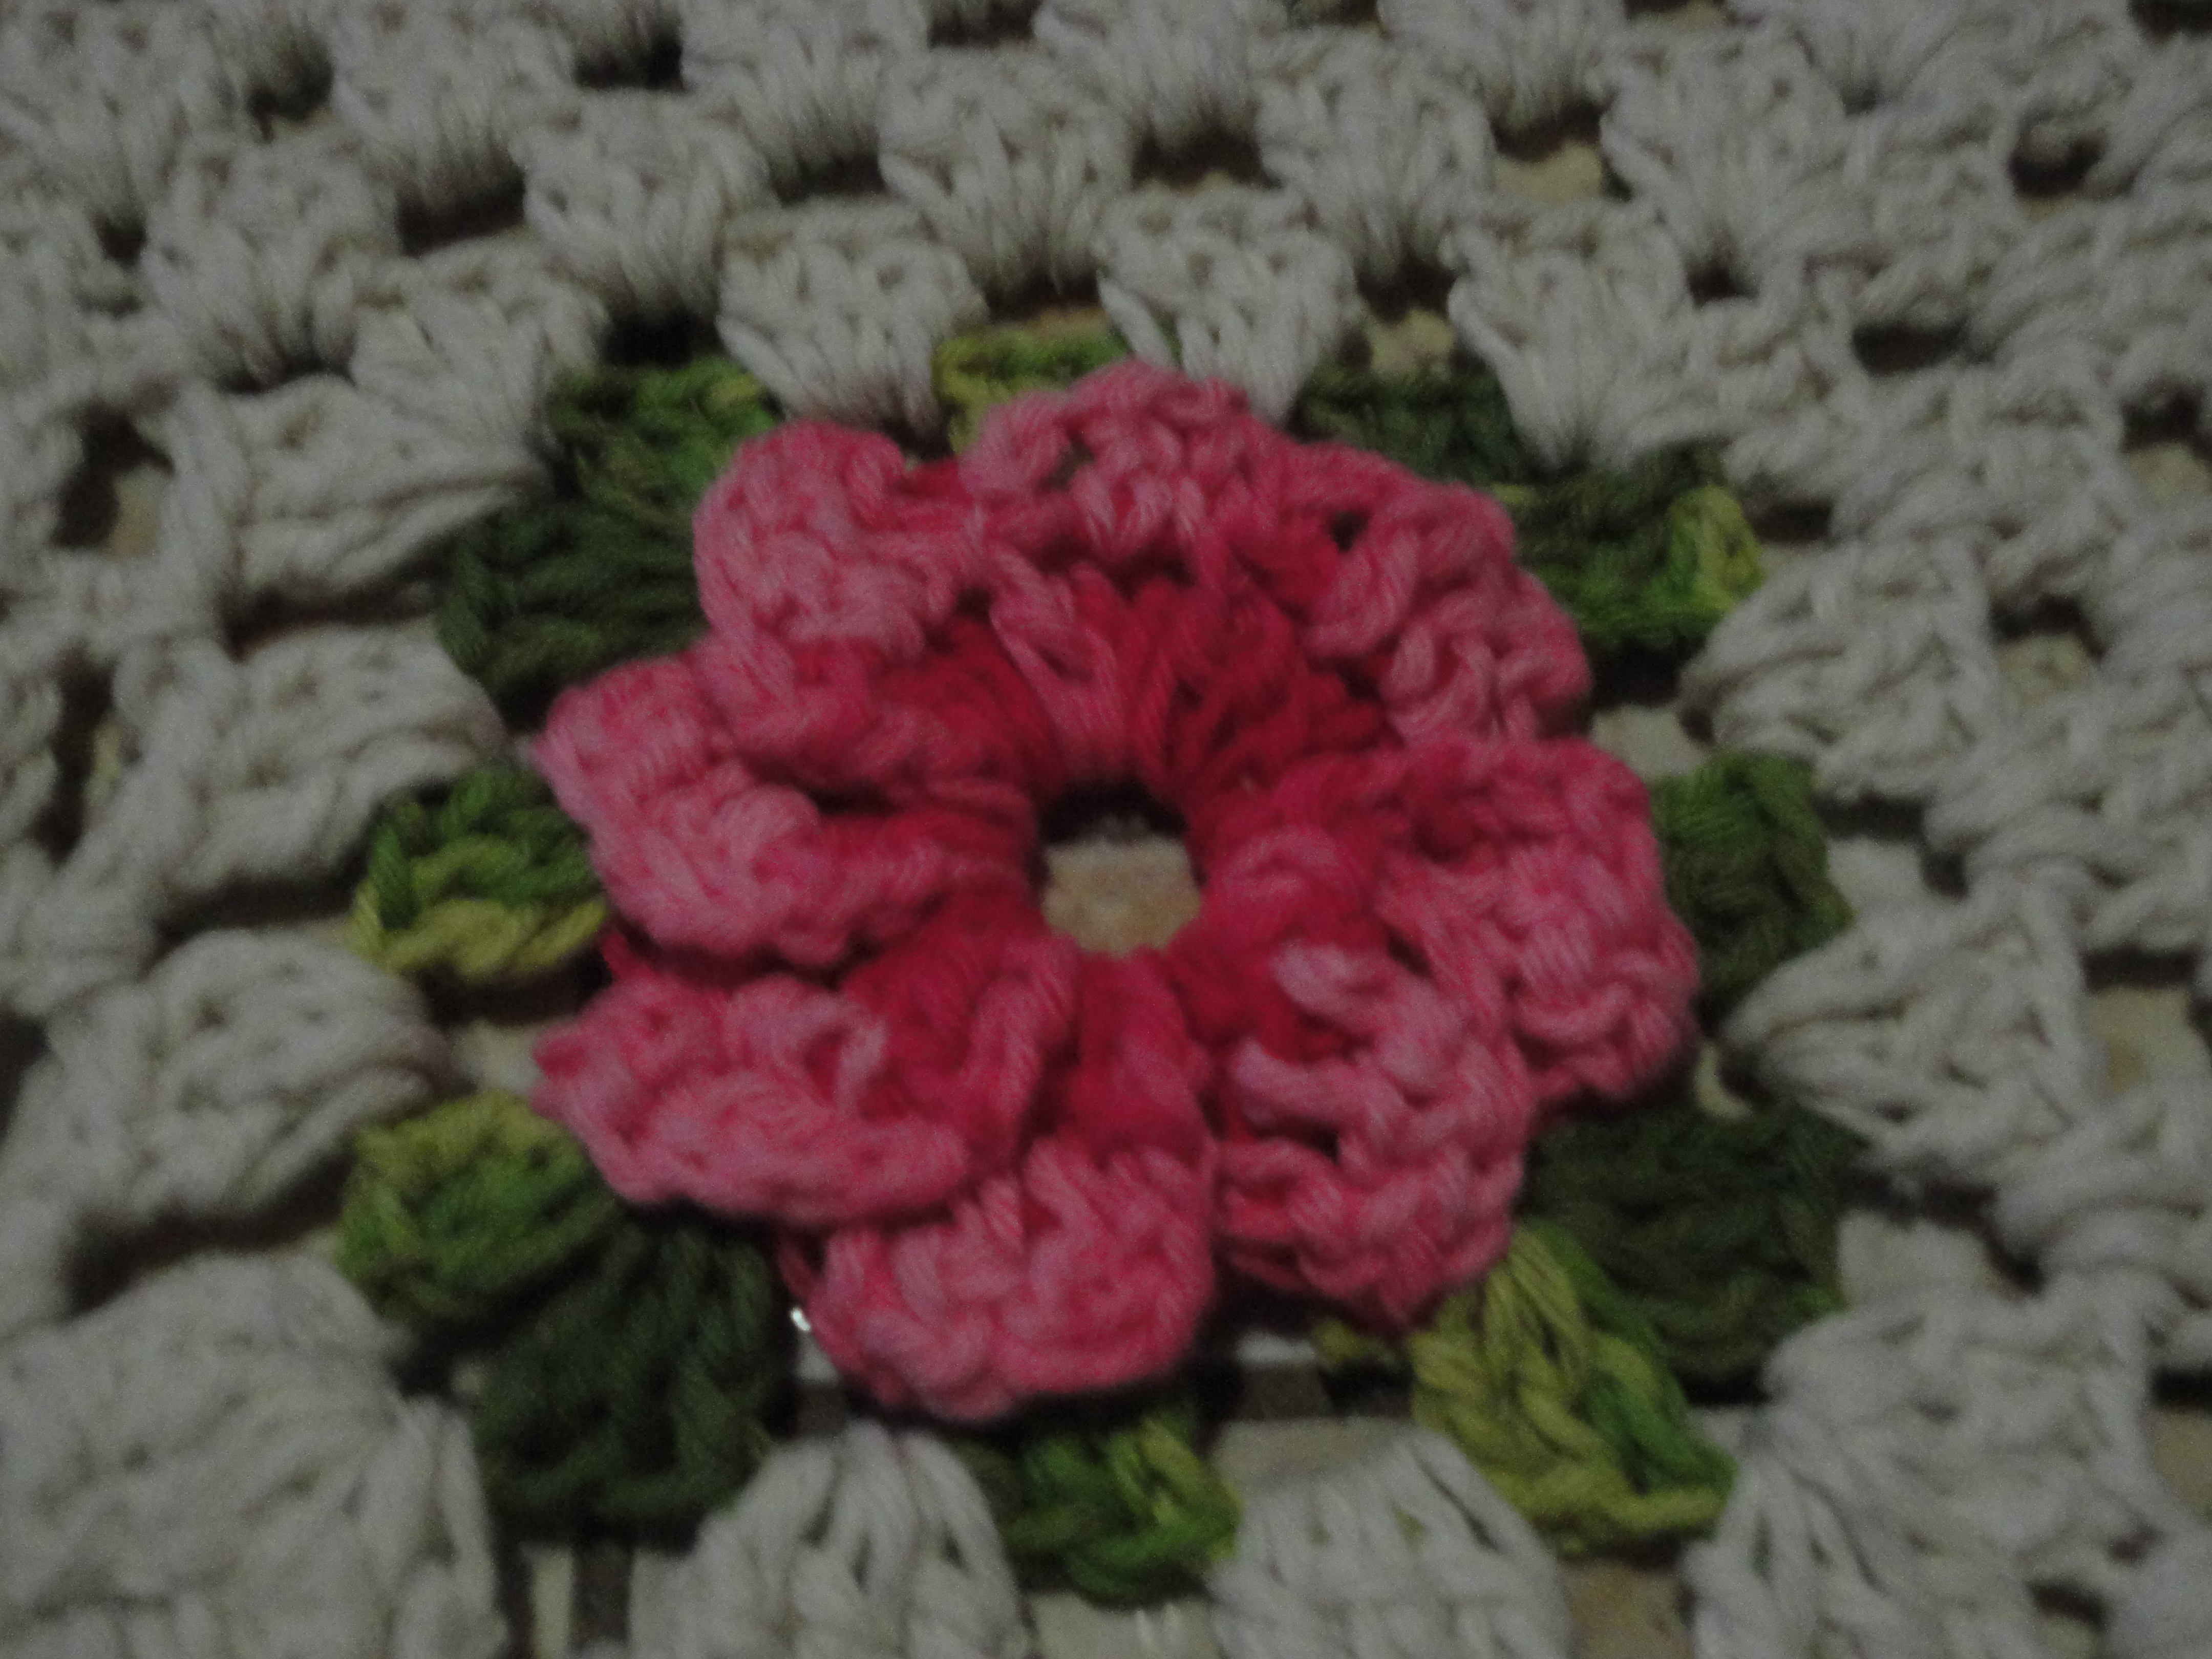 tapete floral de croche elo7. Black Bedroom Furniture Sets. Home Design Ideas